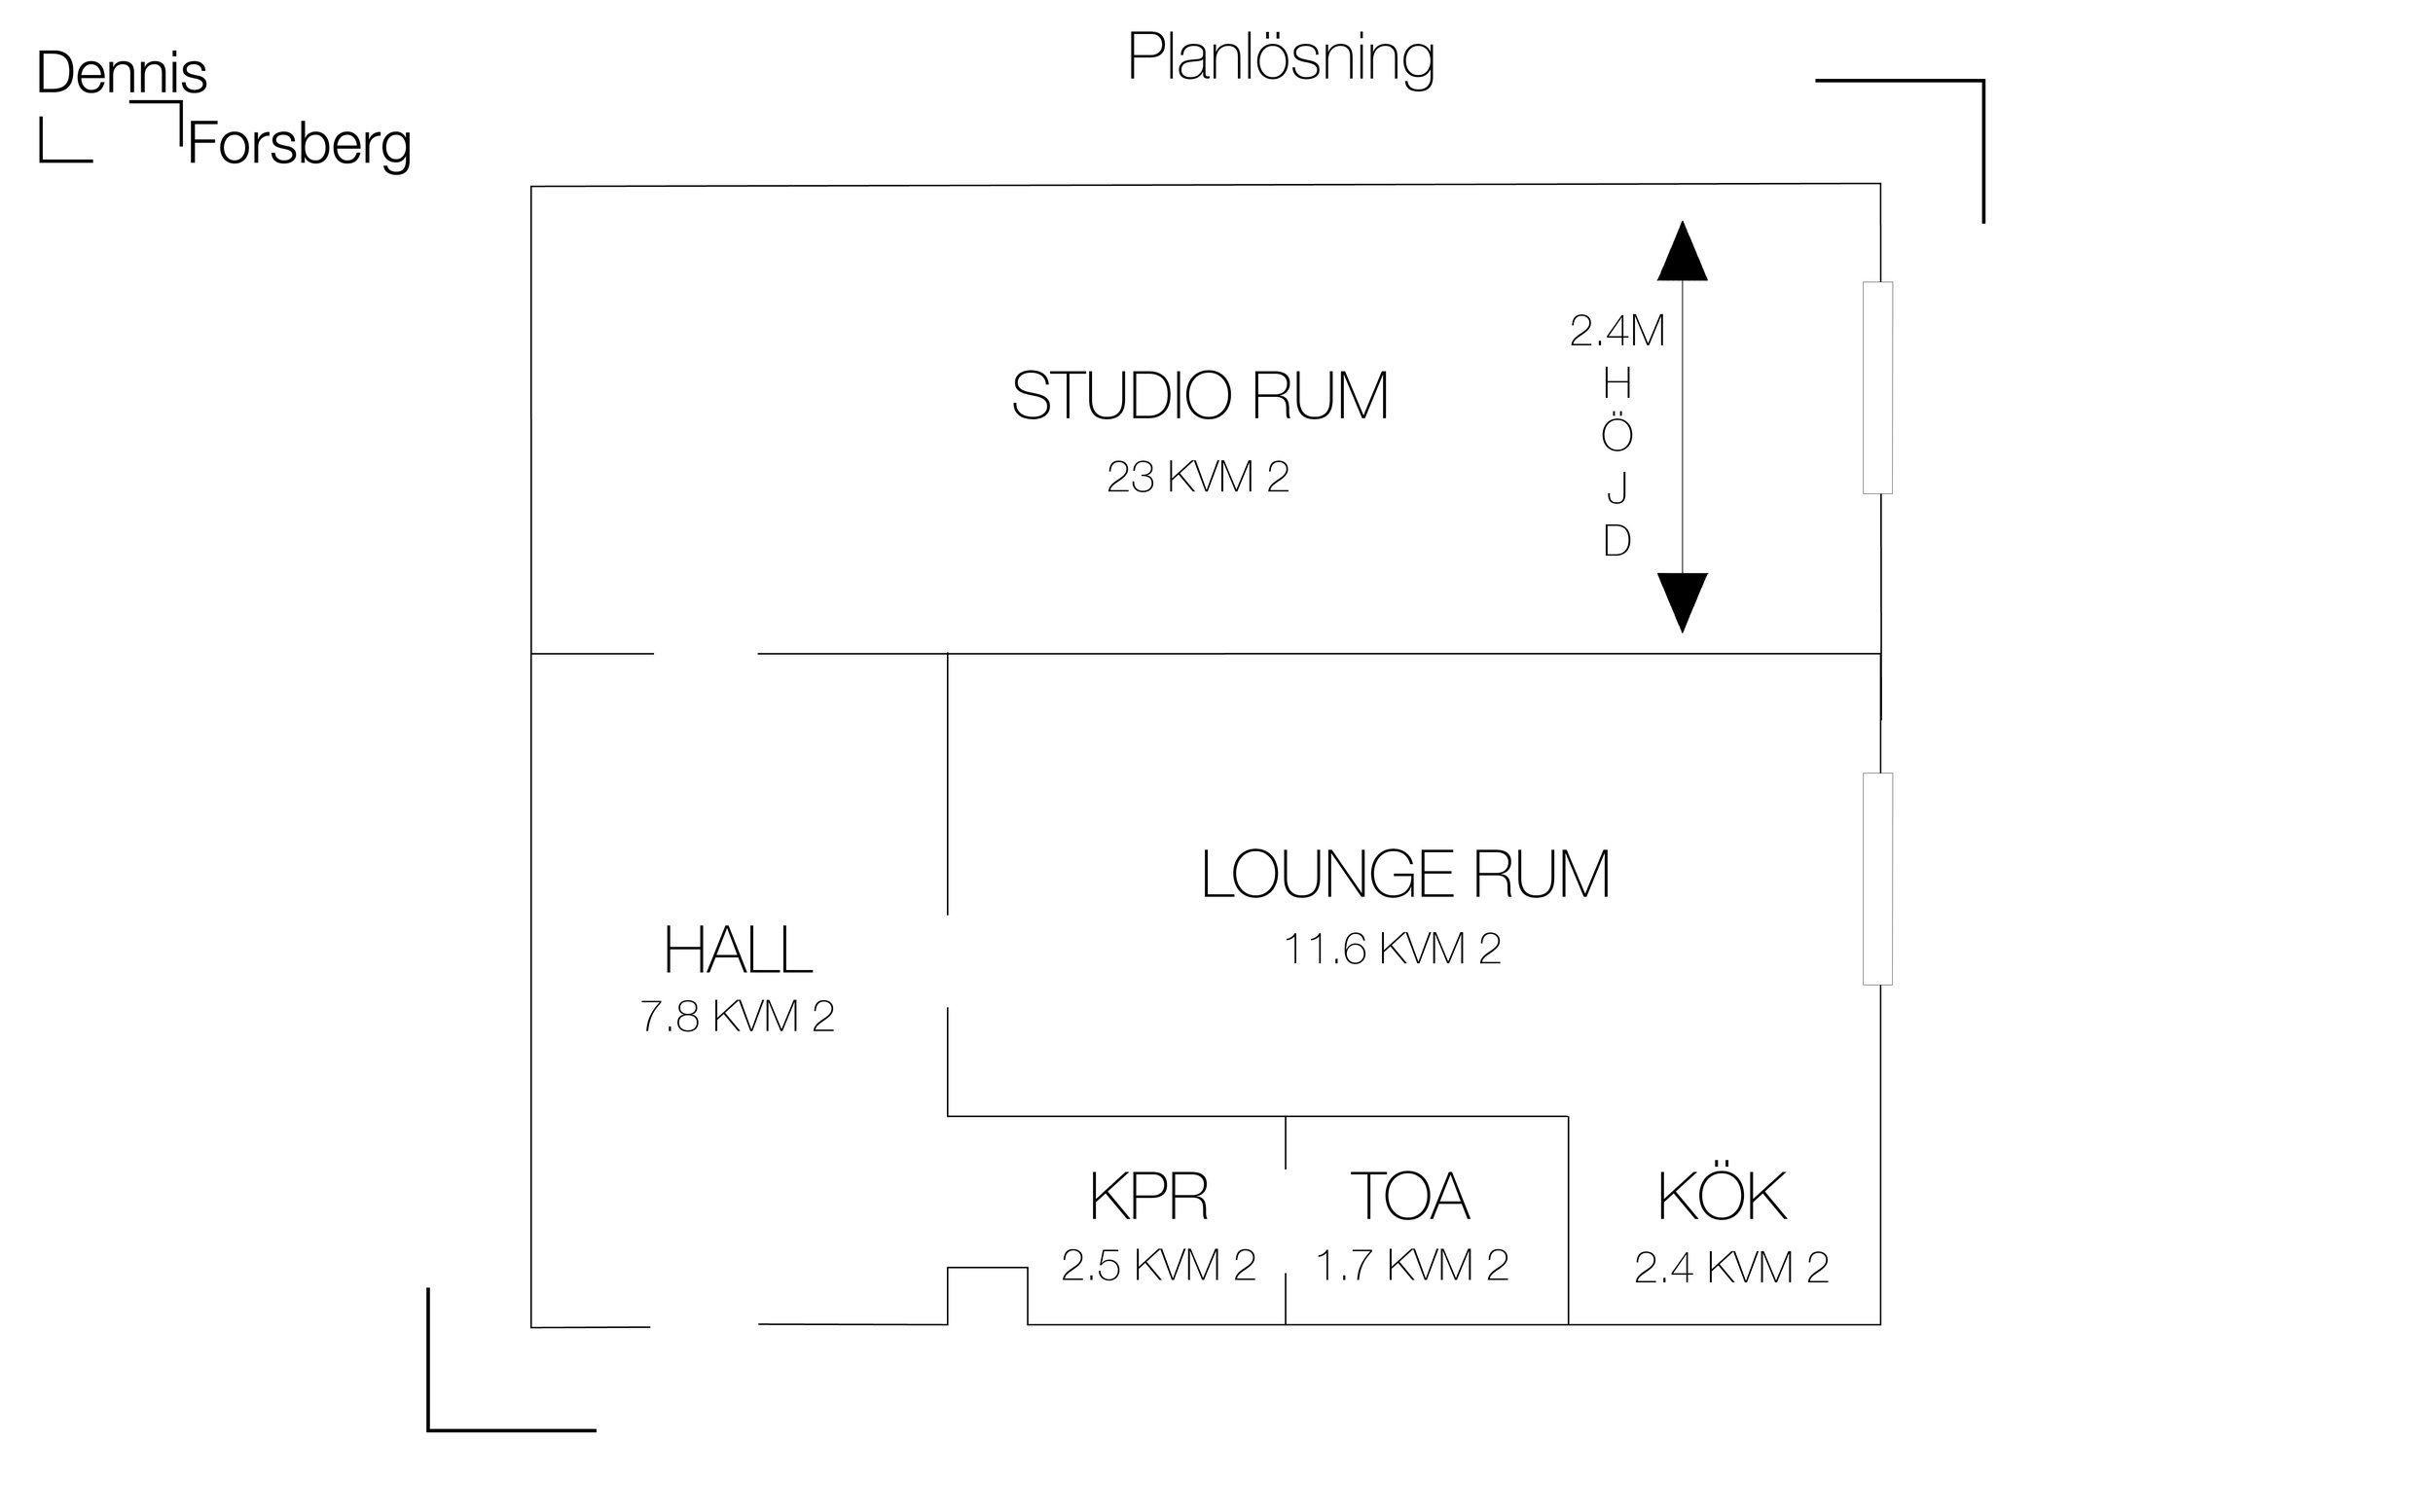 Studio Planlösning 2018.jpg